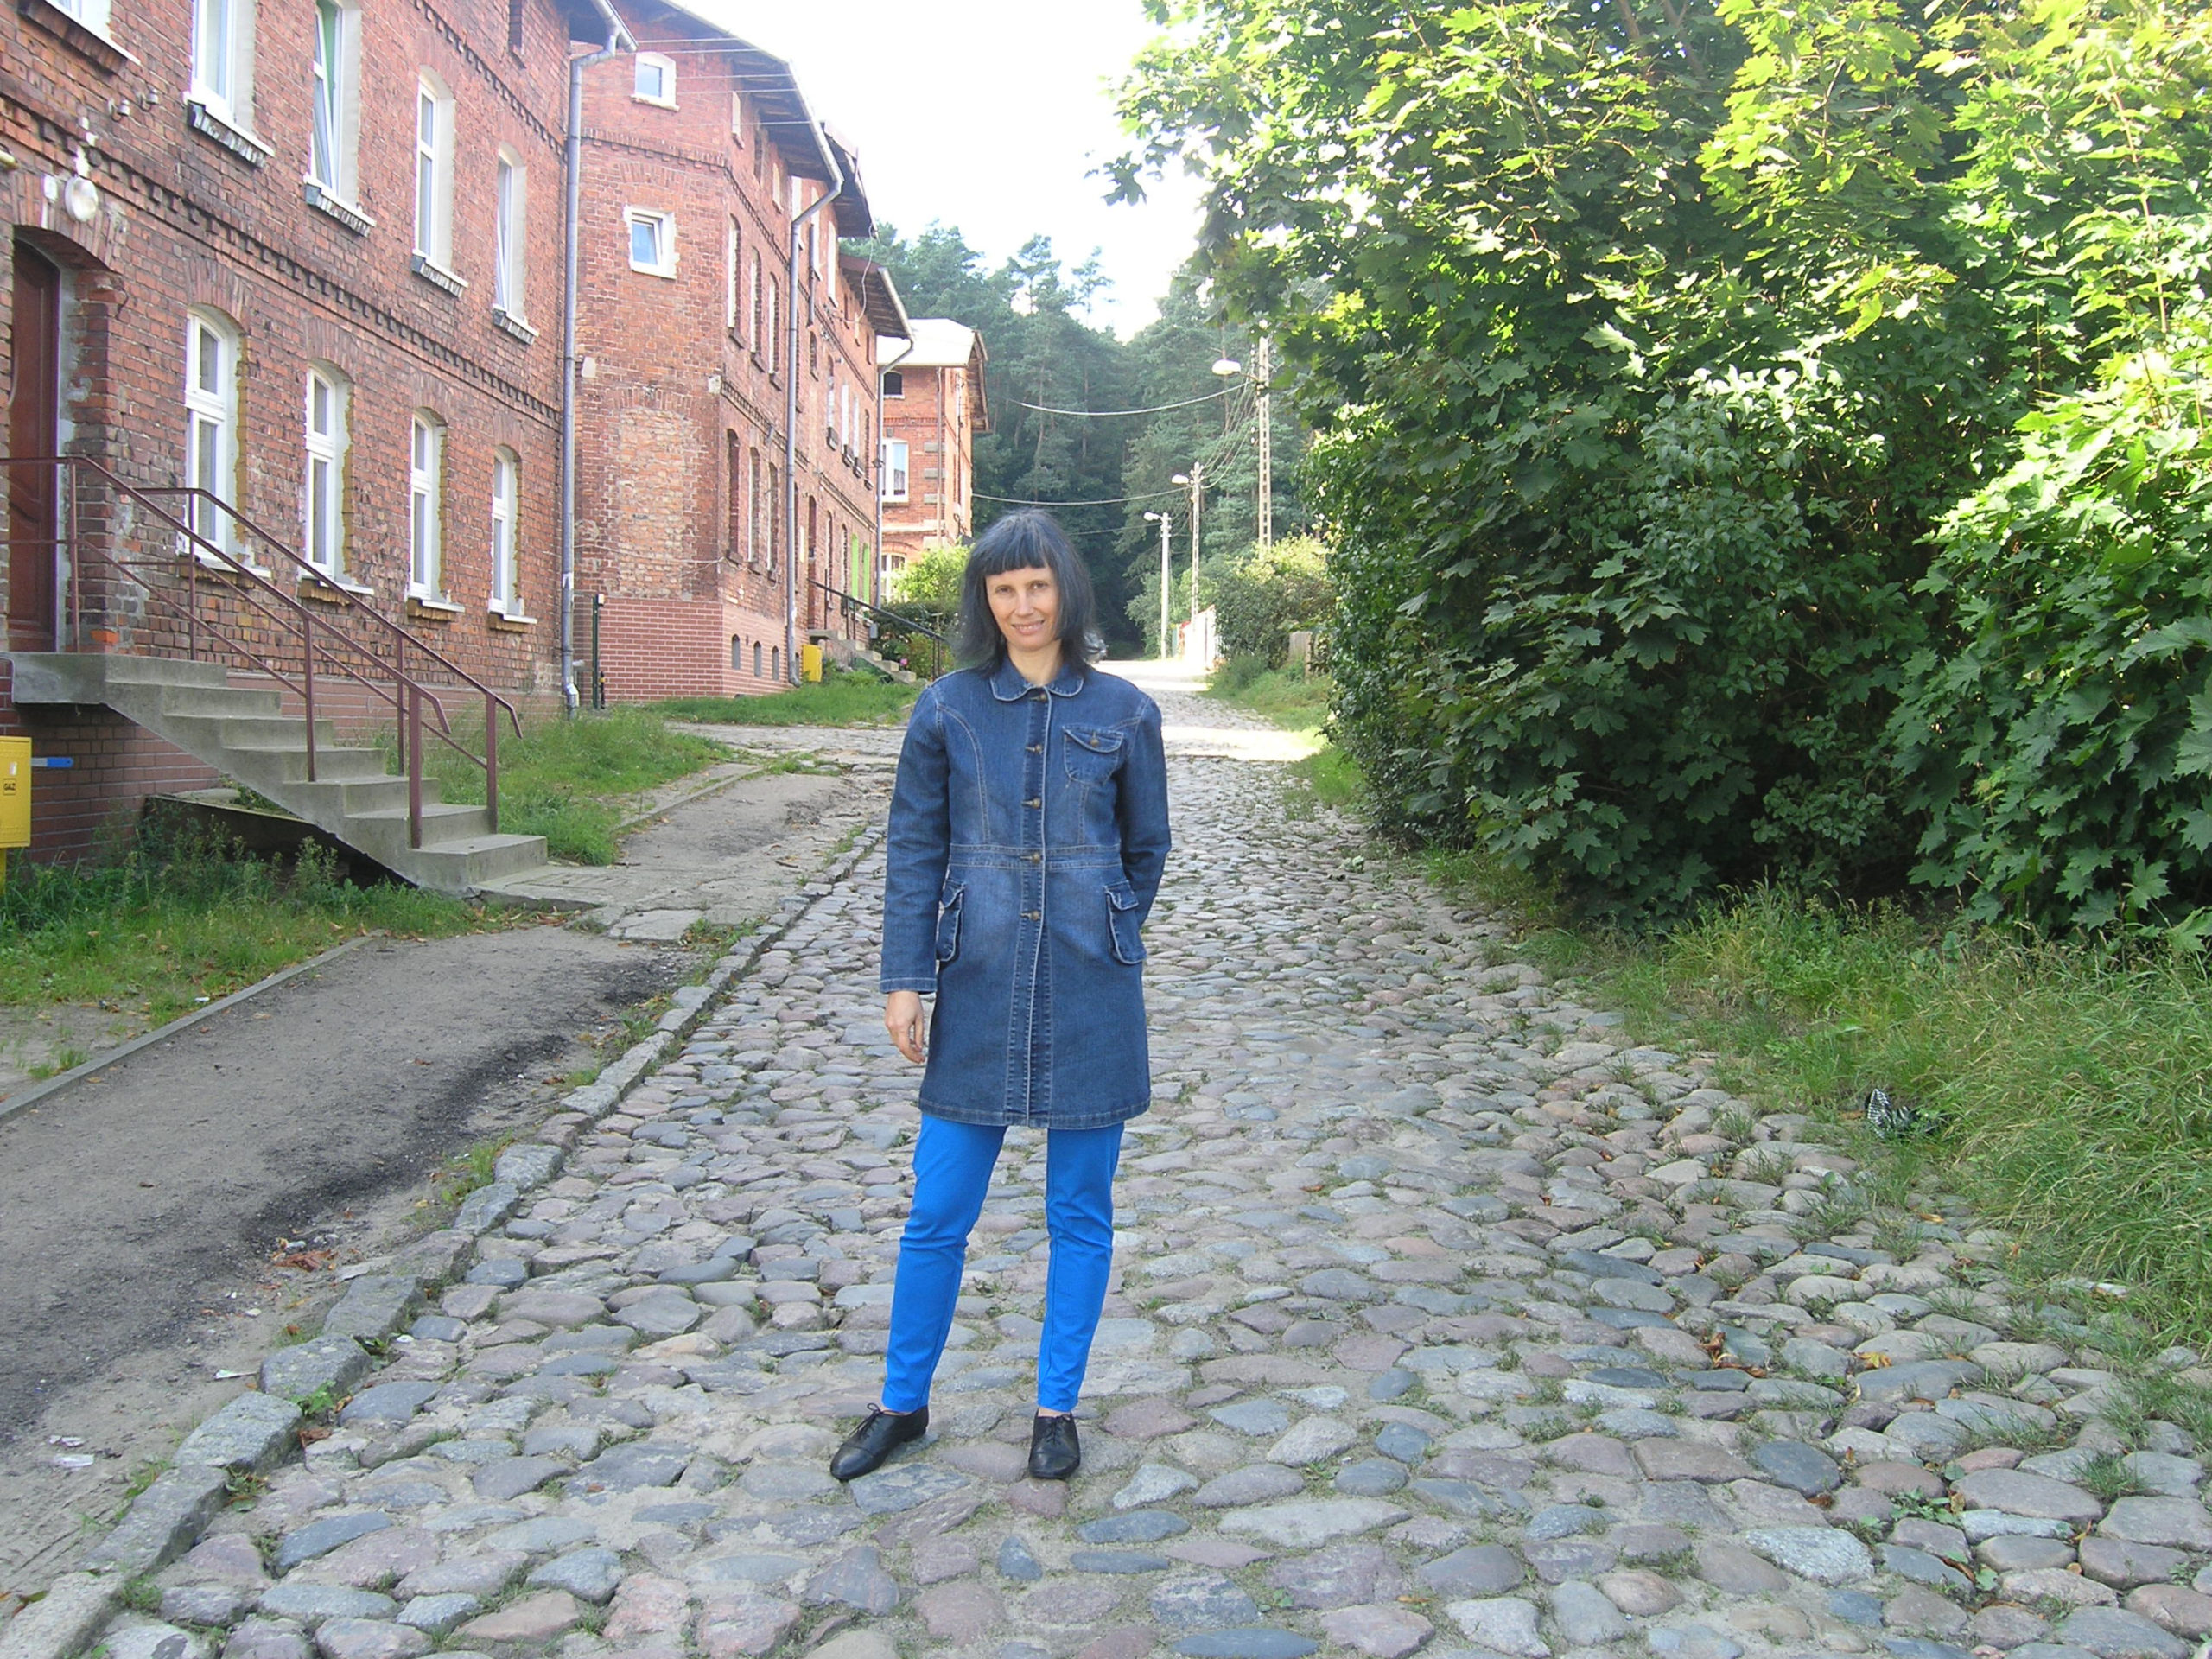 Violetta Wróblewska na tle starych ceglanych budynków